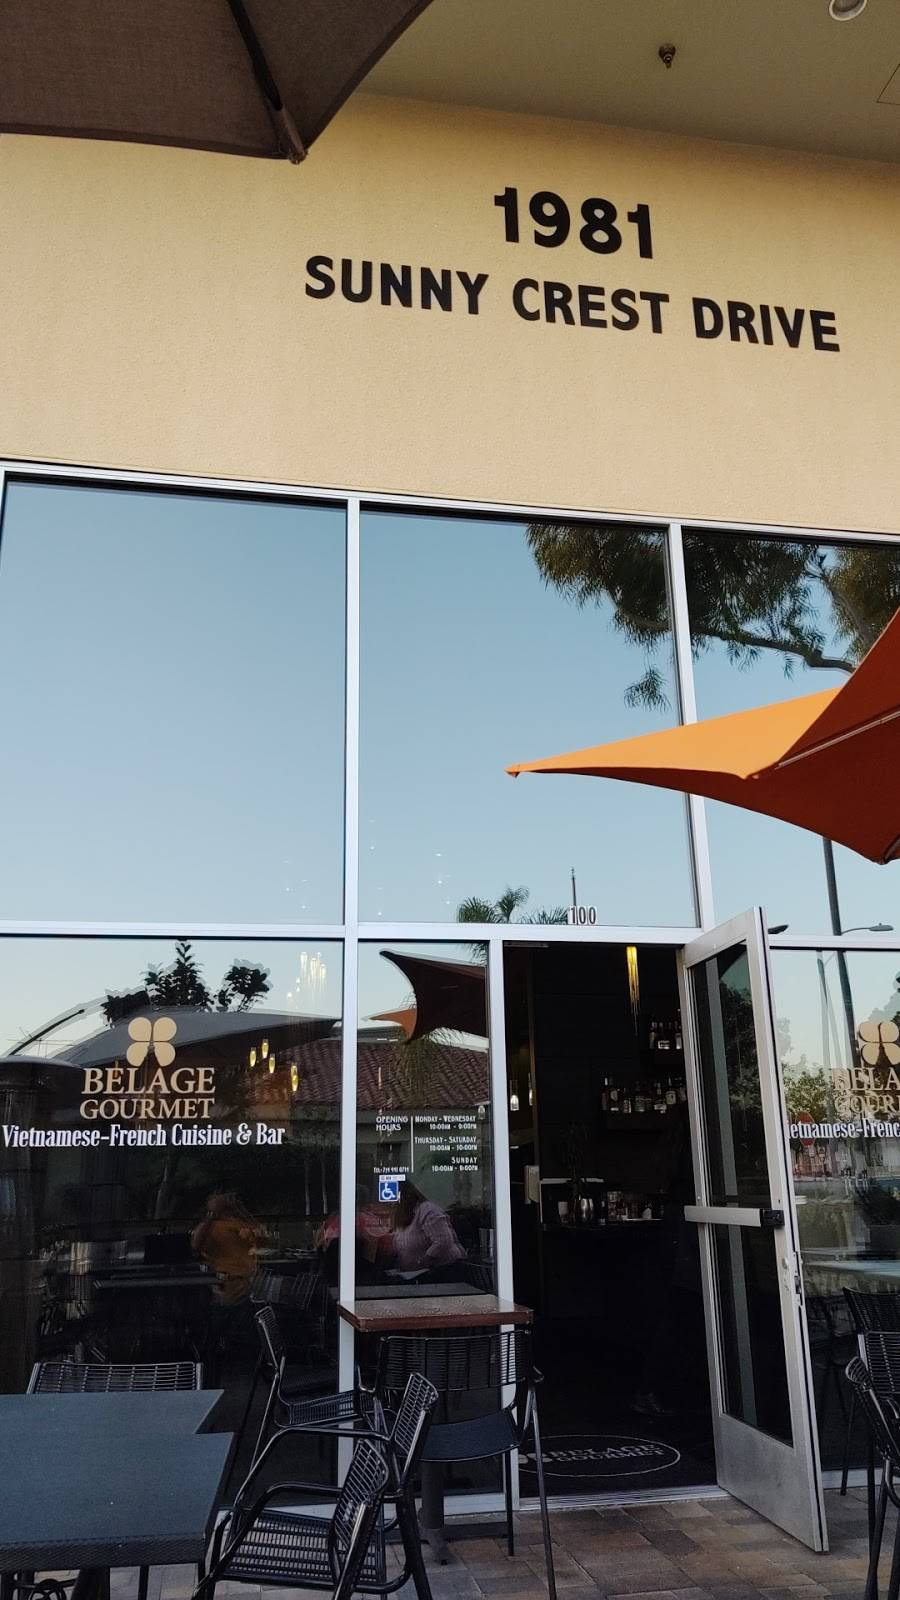 Pokeness | restaurant | 1981 Sunny Crest Dr, Fullerton, CA 92835, USA | 7148719388 OR +1 714-871-9388